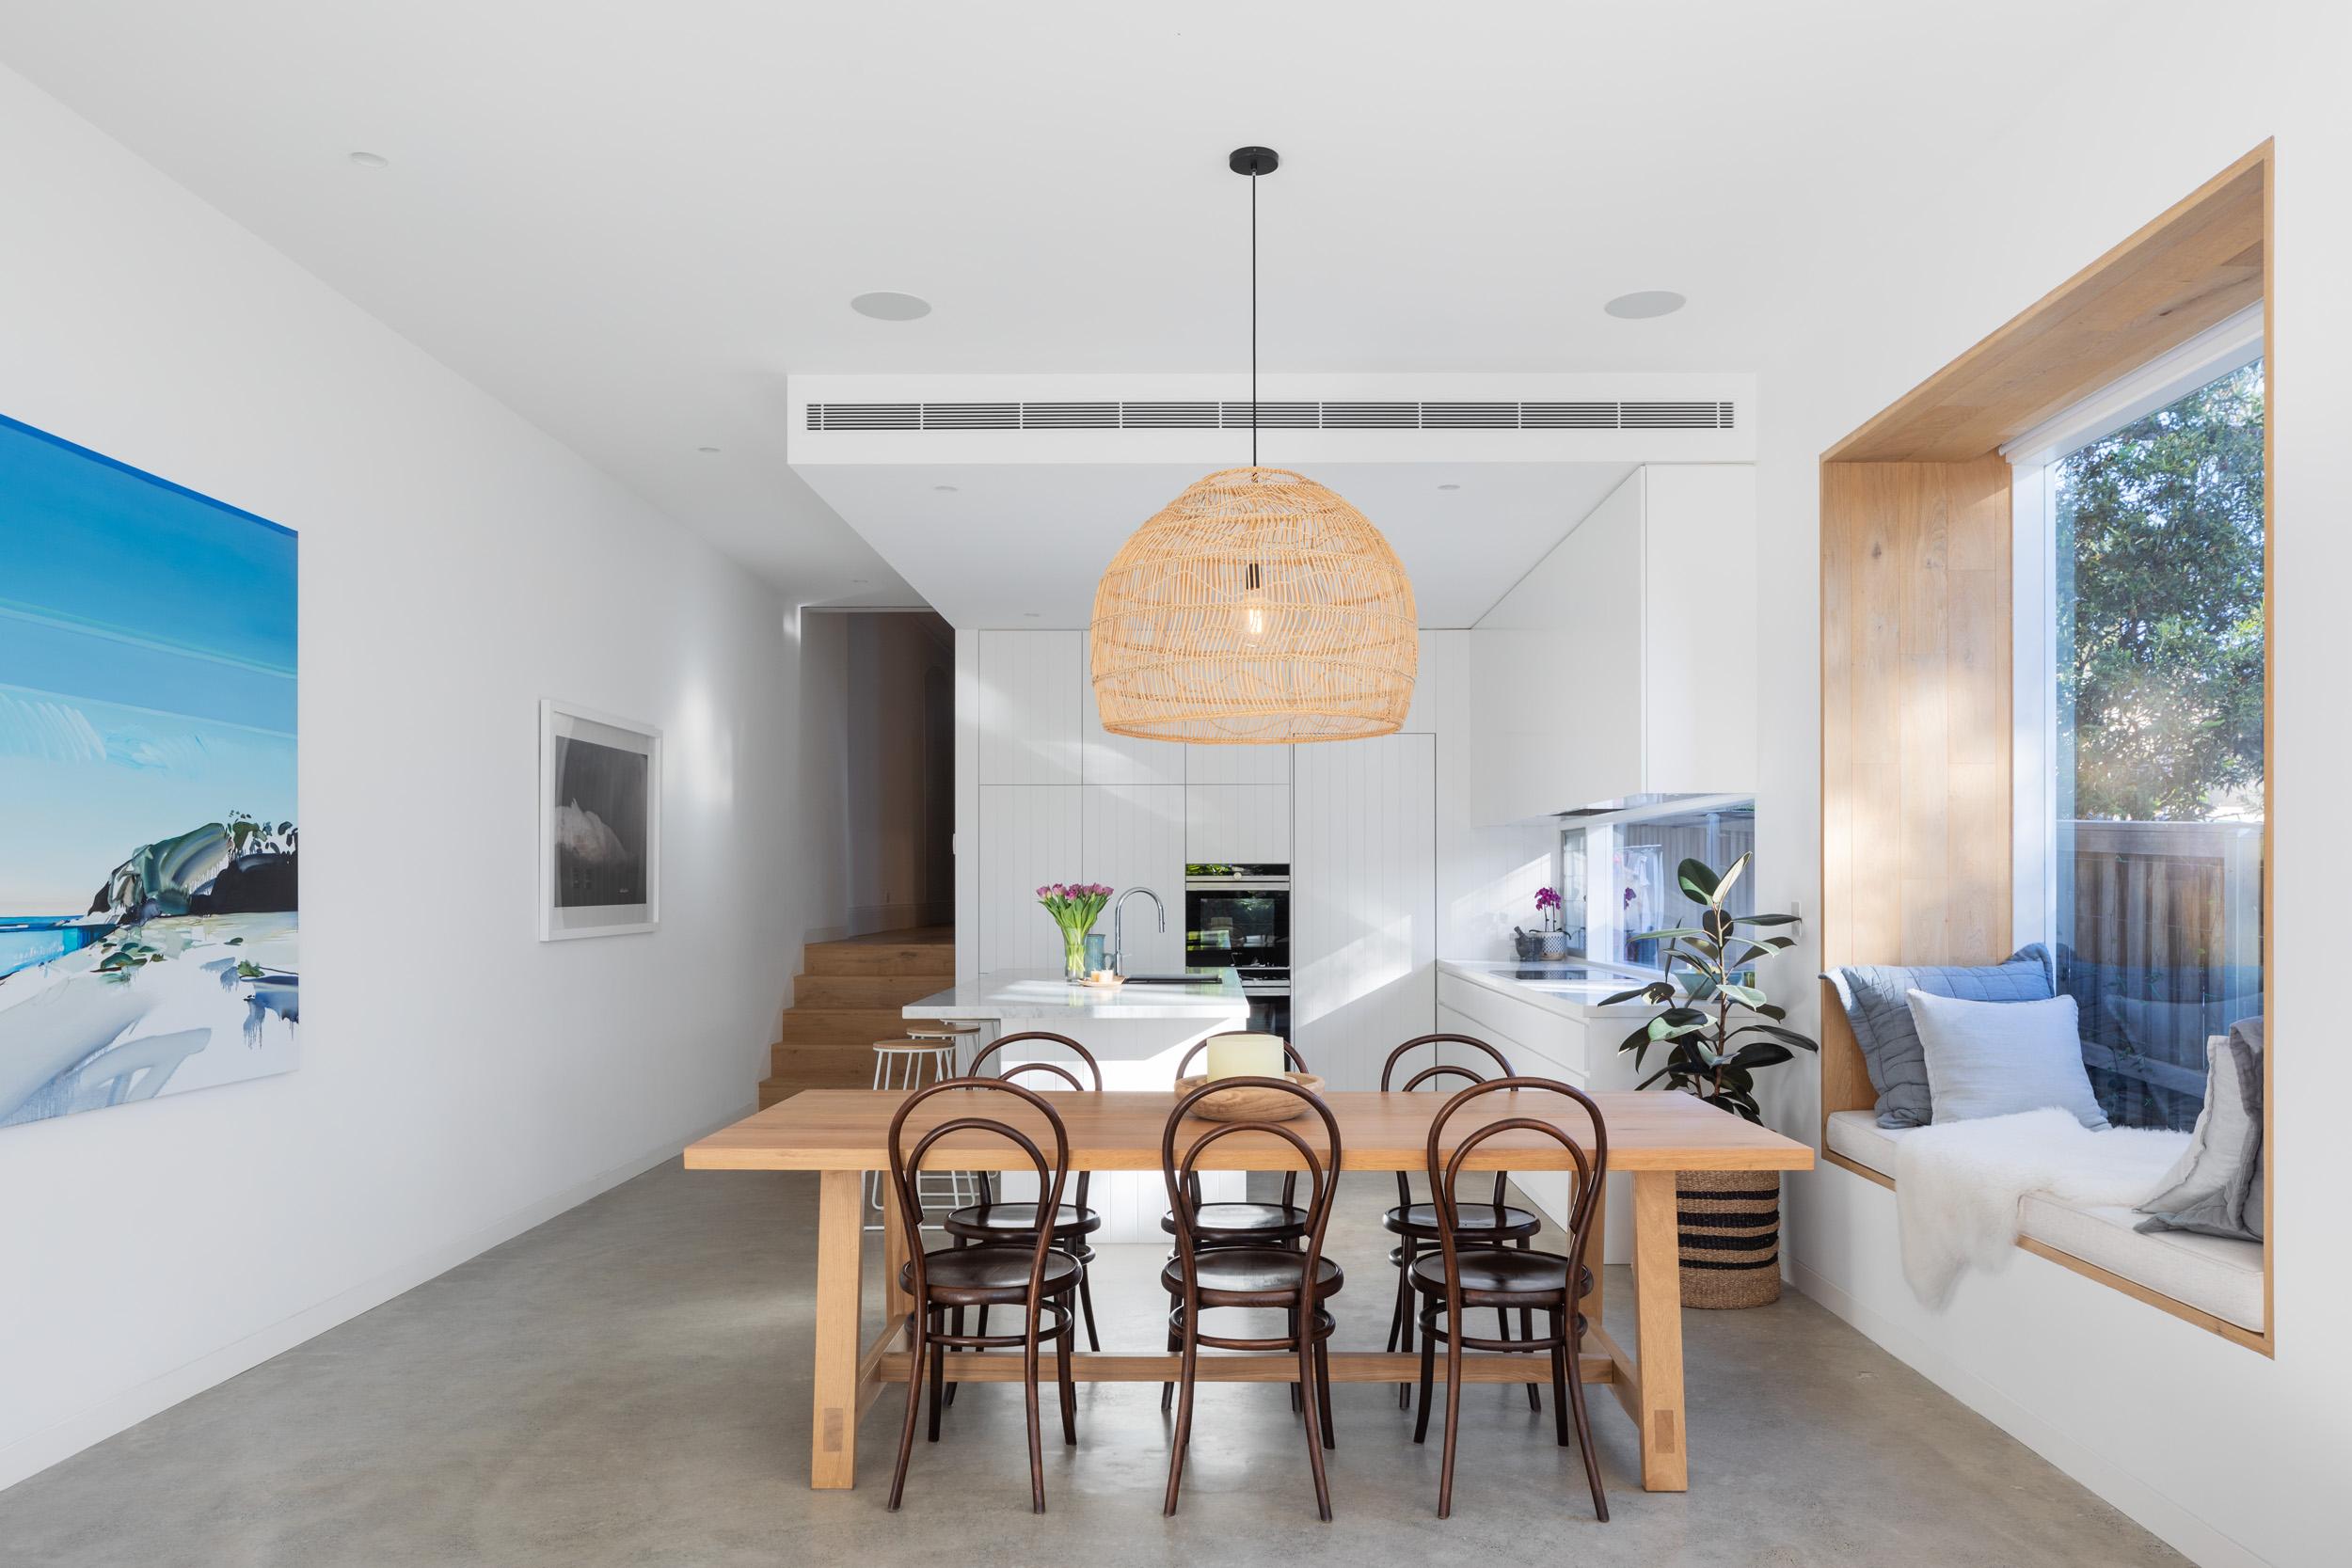 Jem_Cresswell_Architecture_Residential_Photographer_Sydney_Australia_013.jpg